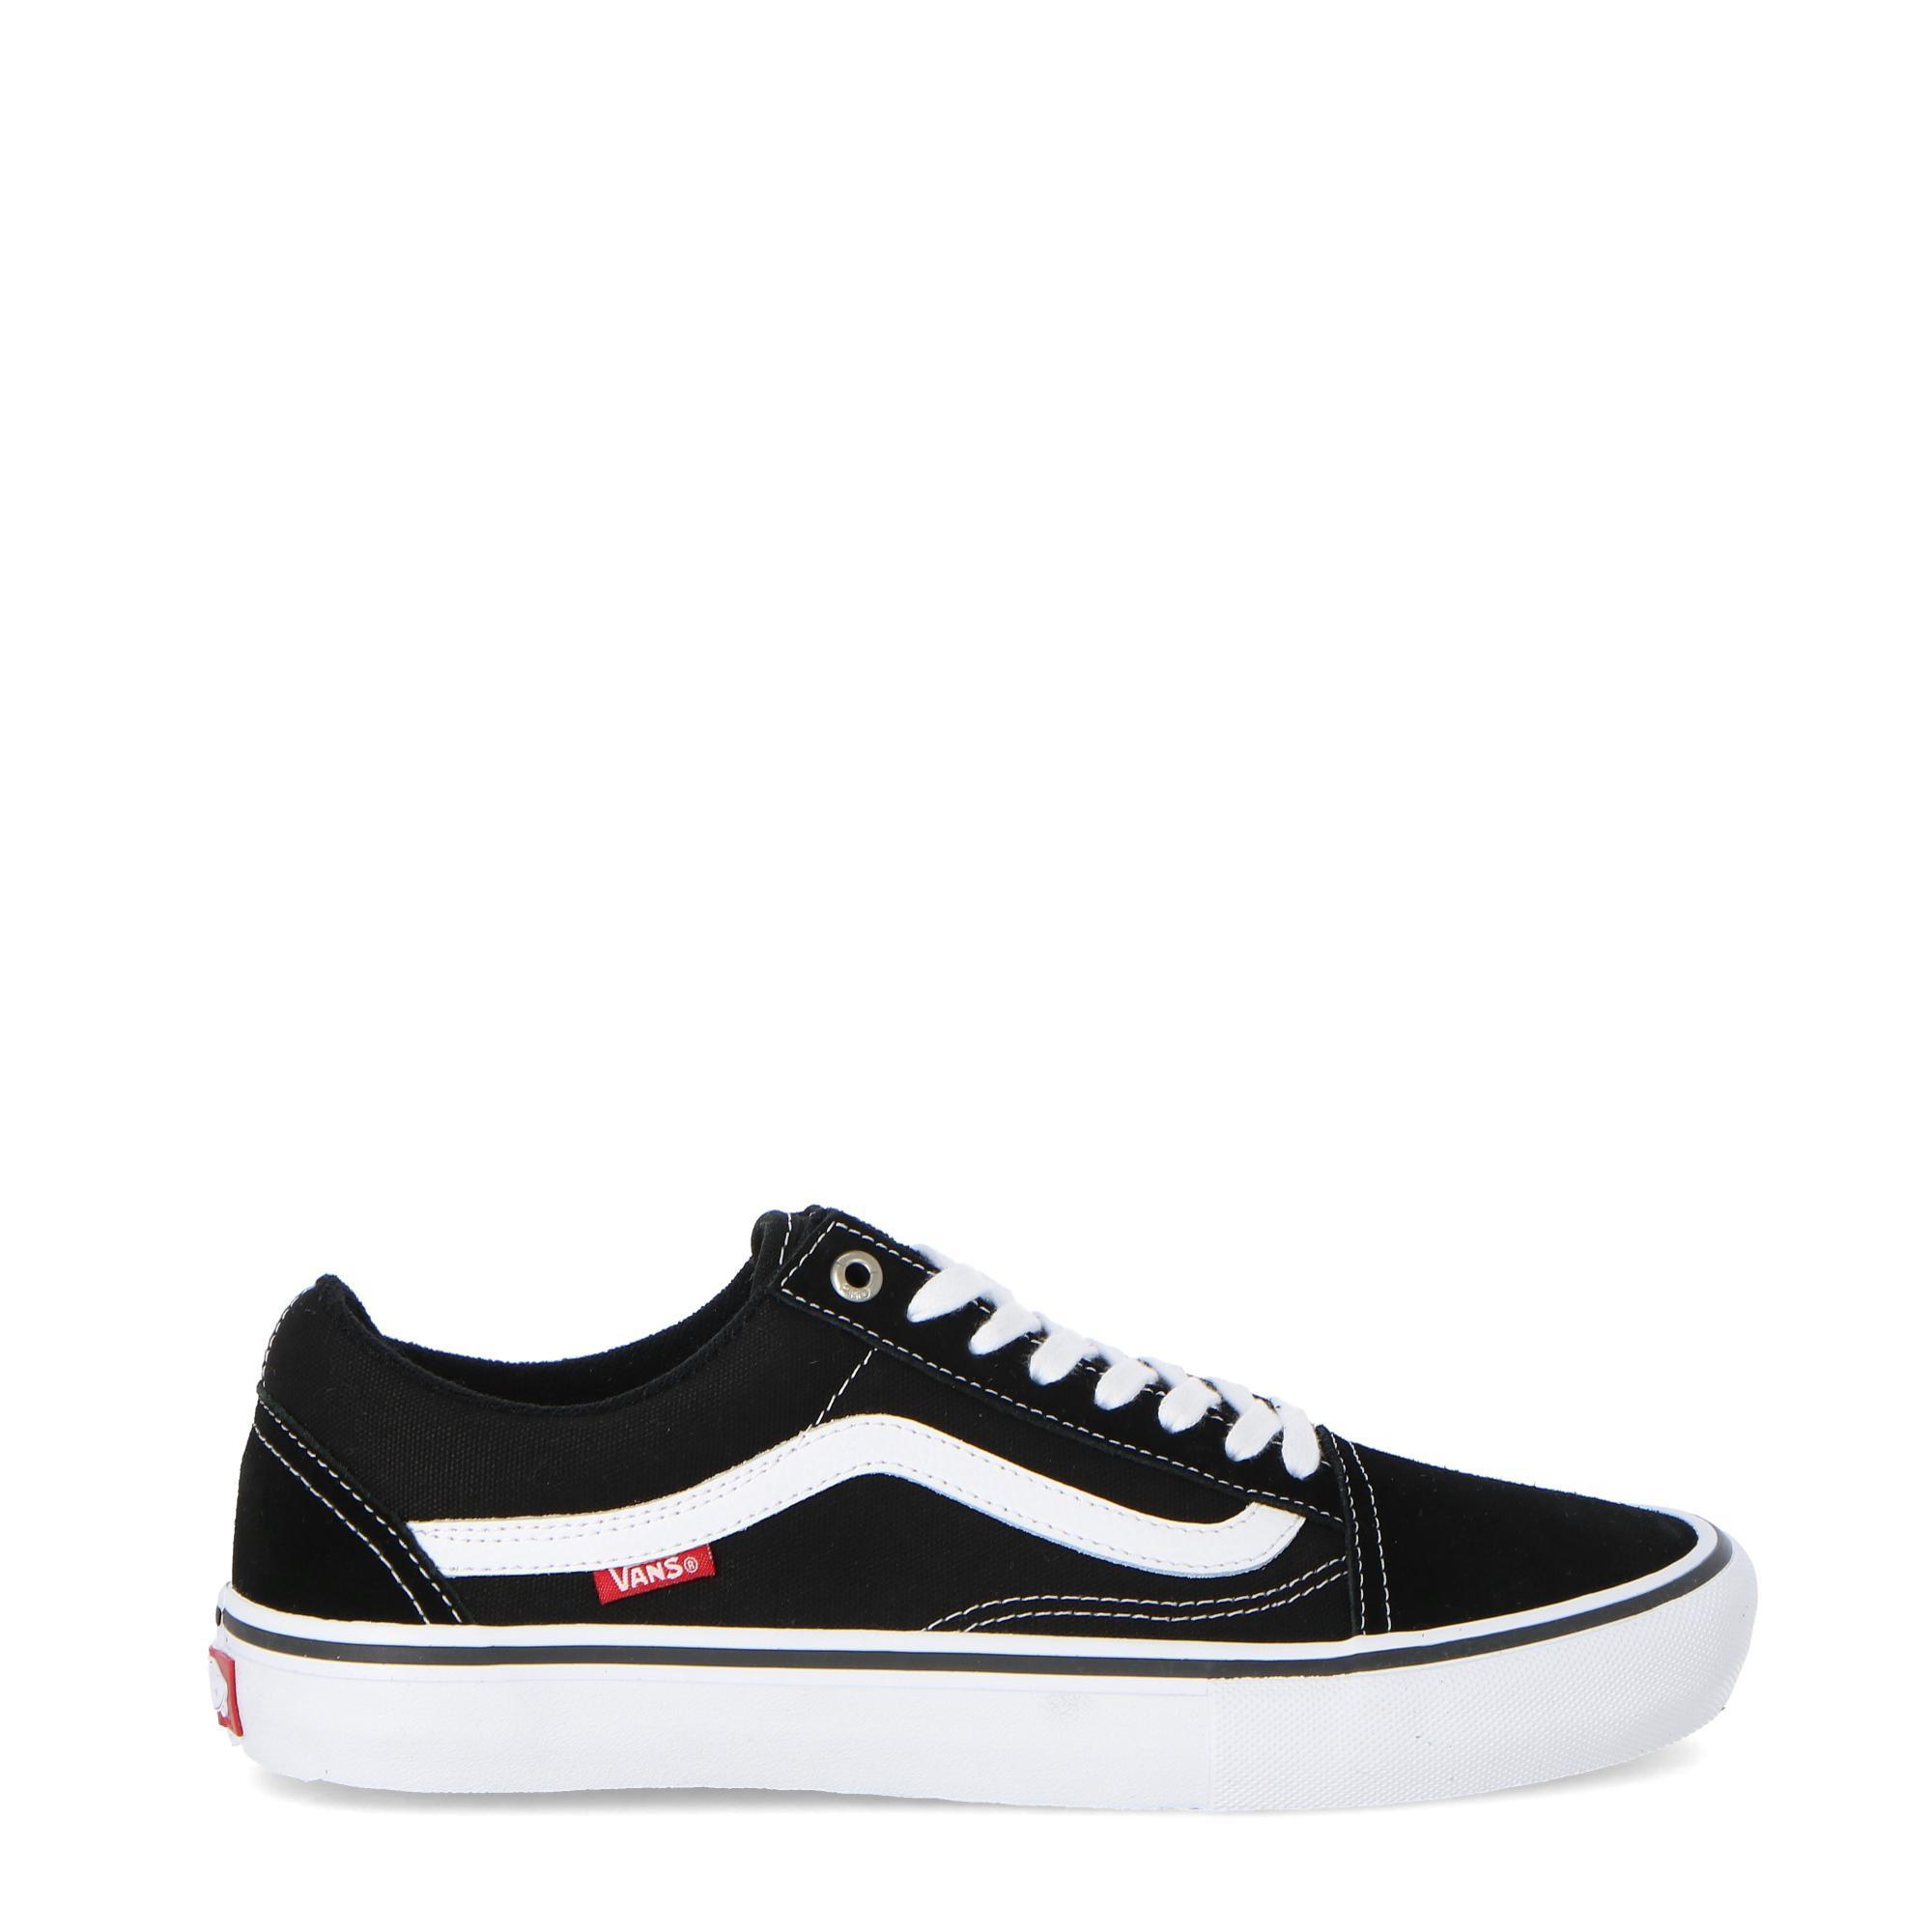 Vans Old Skool Pro Black white